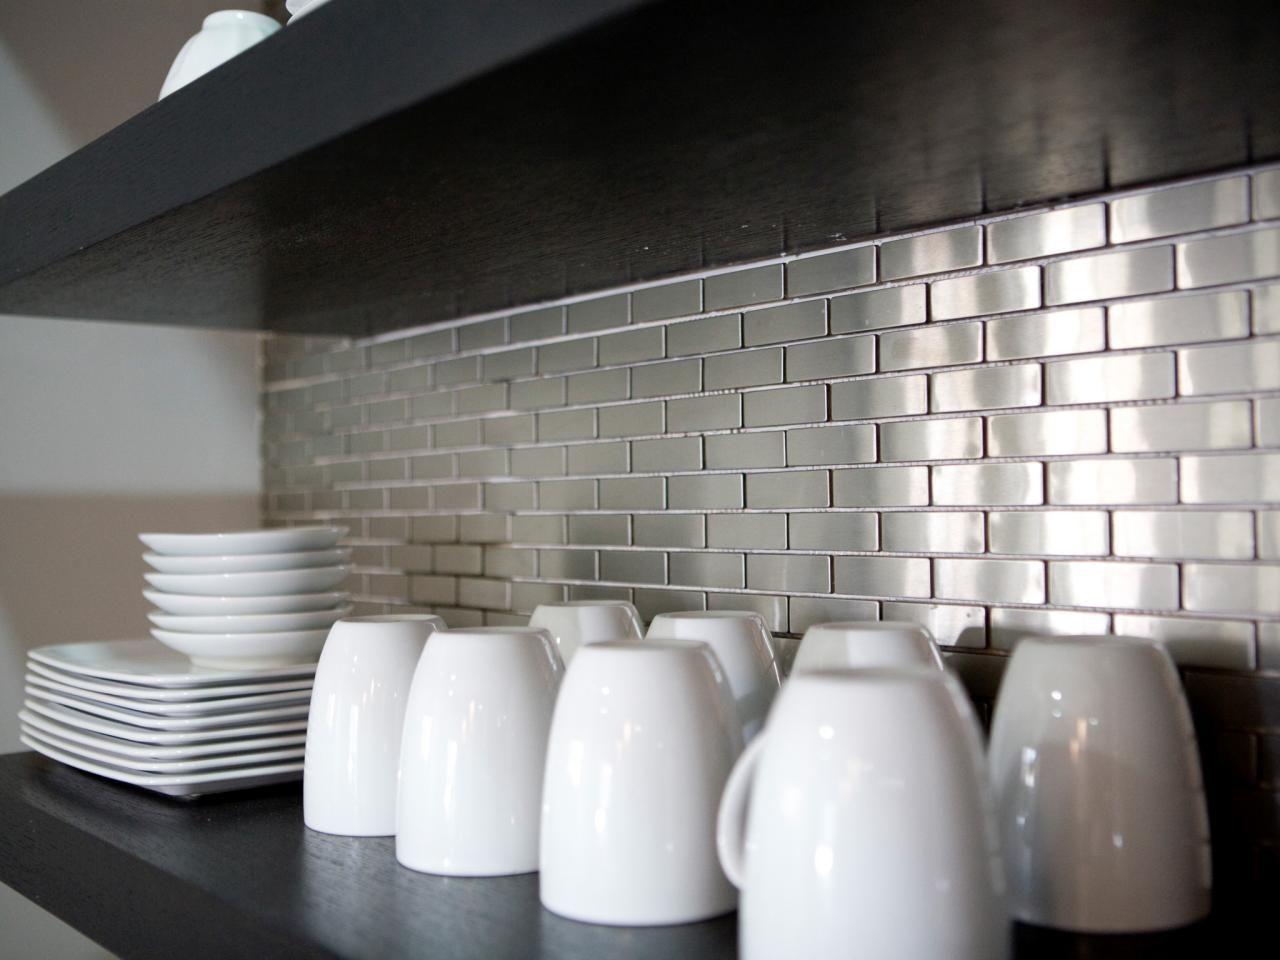 Marvelous Kitchen Backsplash Stainless Steel Ideas Part - 5: Stainless Steel Backsplashes: Pictures U0026 Ideas From